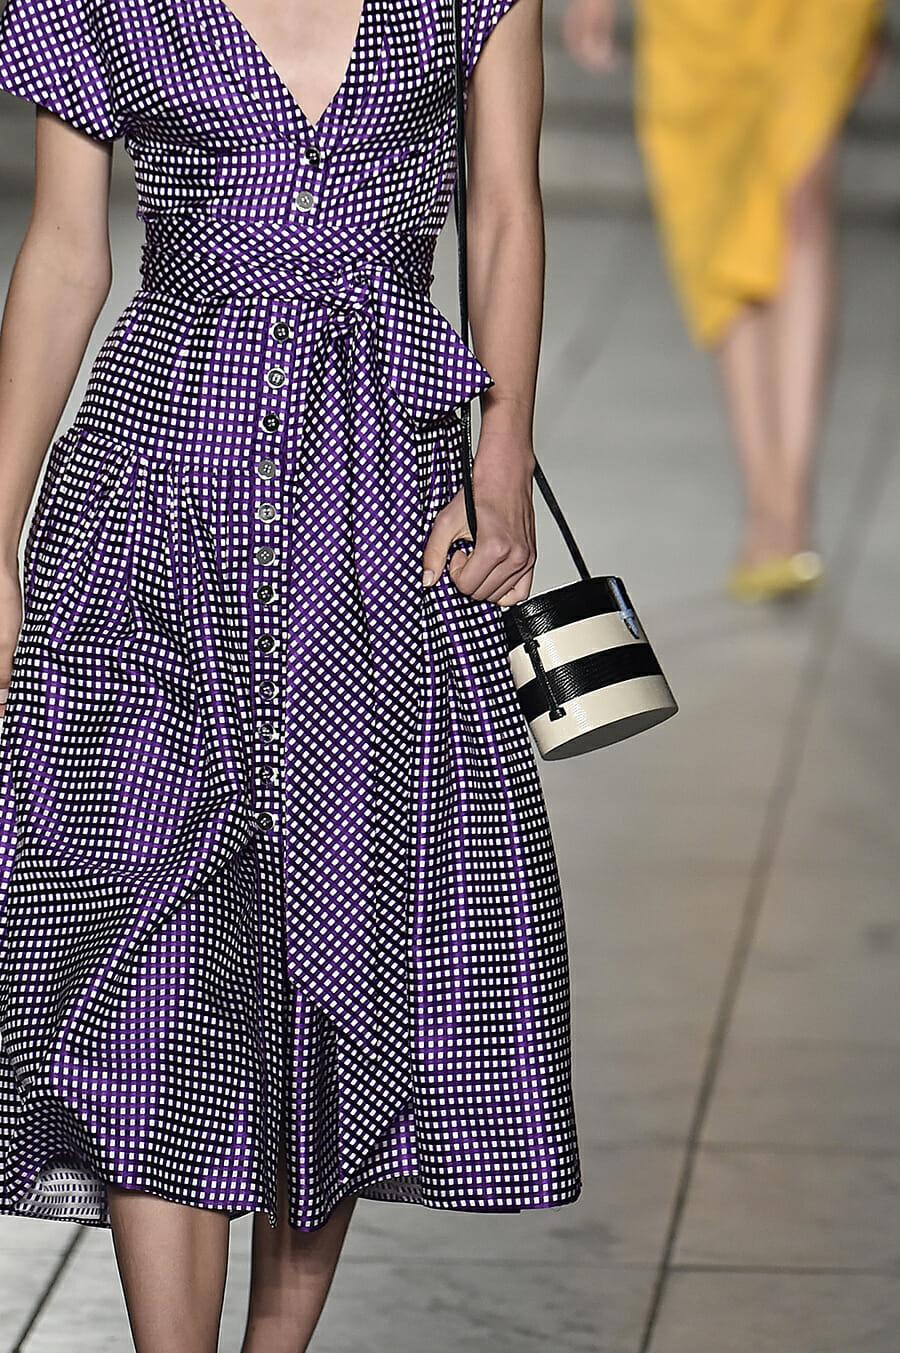 Carolina-Herrera-New-York-Fashion-Week-Spring-Summer-2018-NY-September-2017-look4-detail3